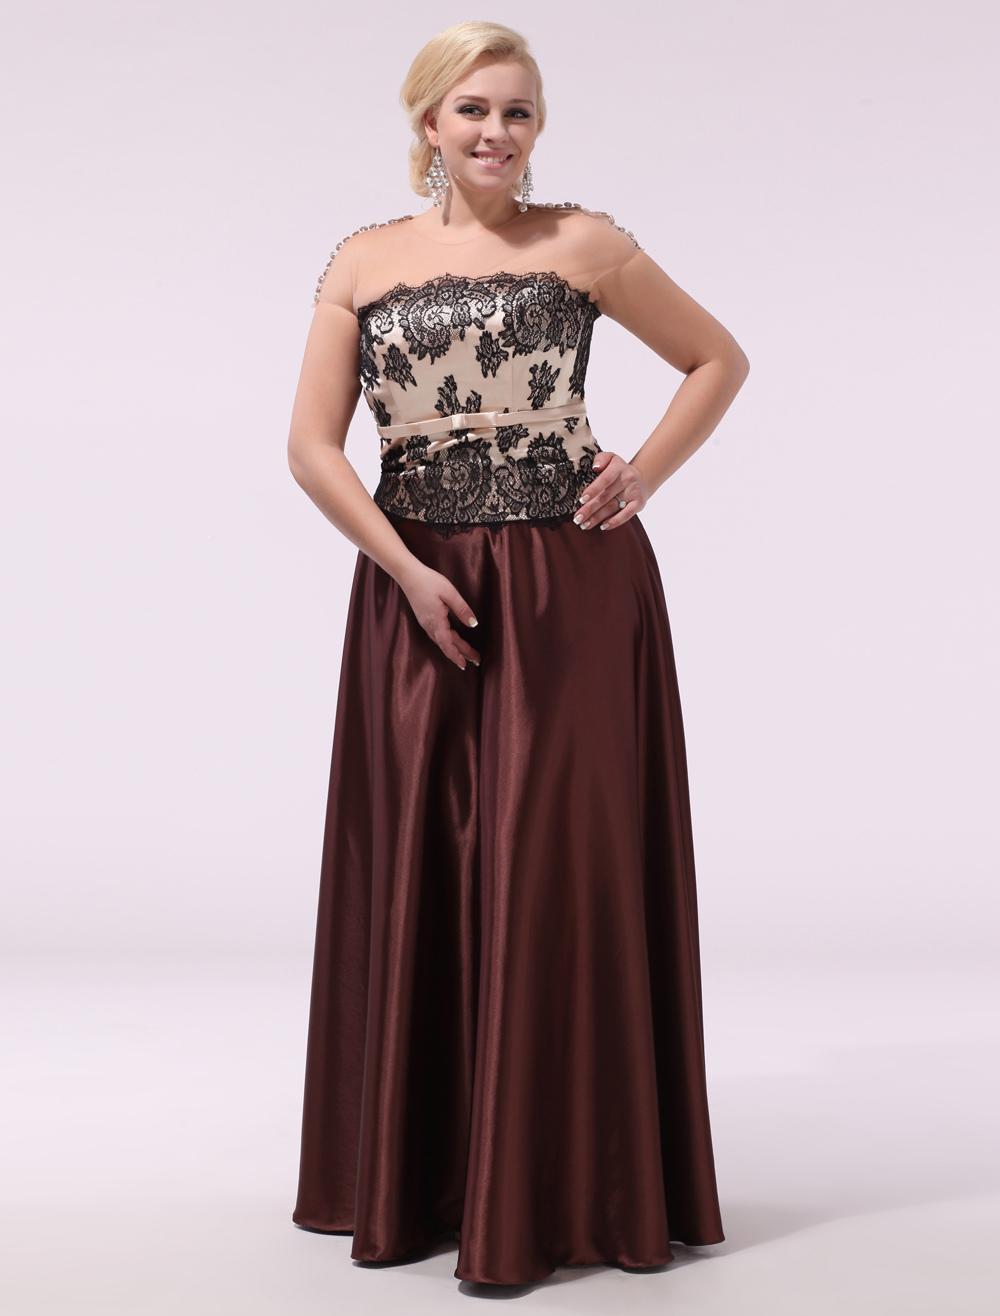 Plus Size Prom Dresses Strapless Long Formal Dress Dark Brown Lace Satin Floor Length Evening Dress Milanoo (Wedding Evening Dresses) photo